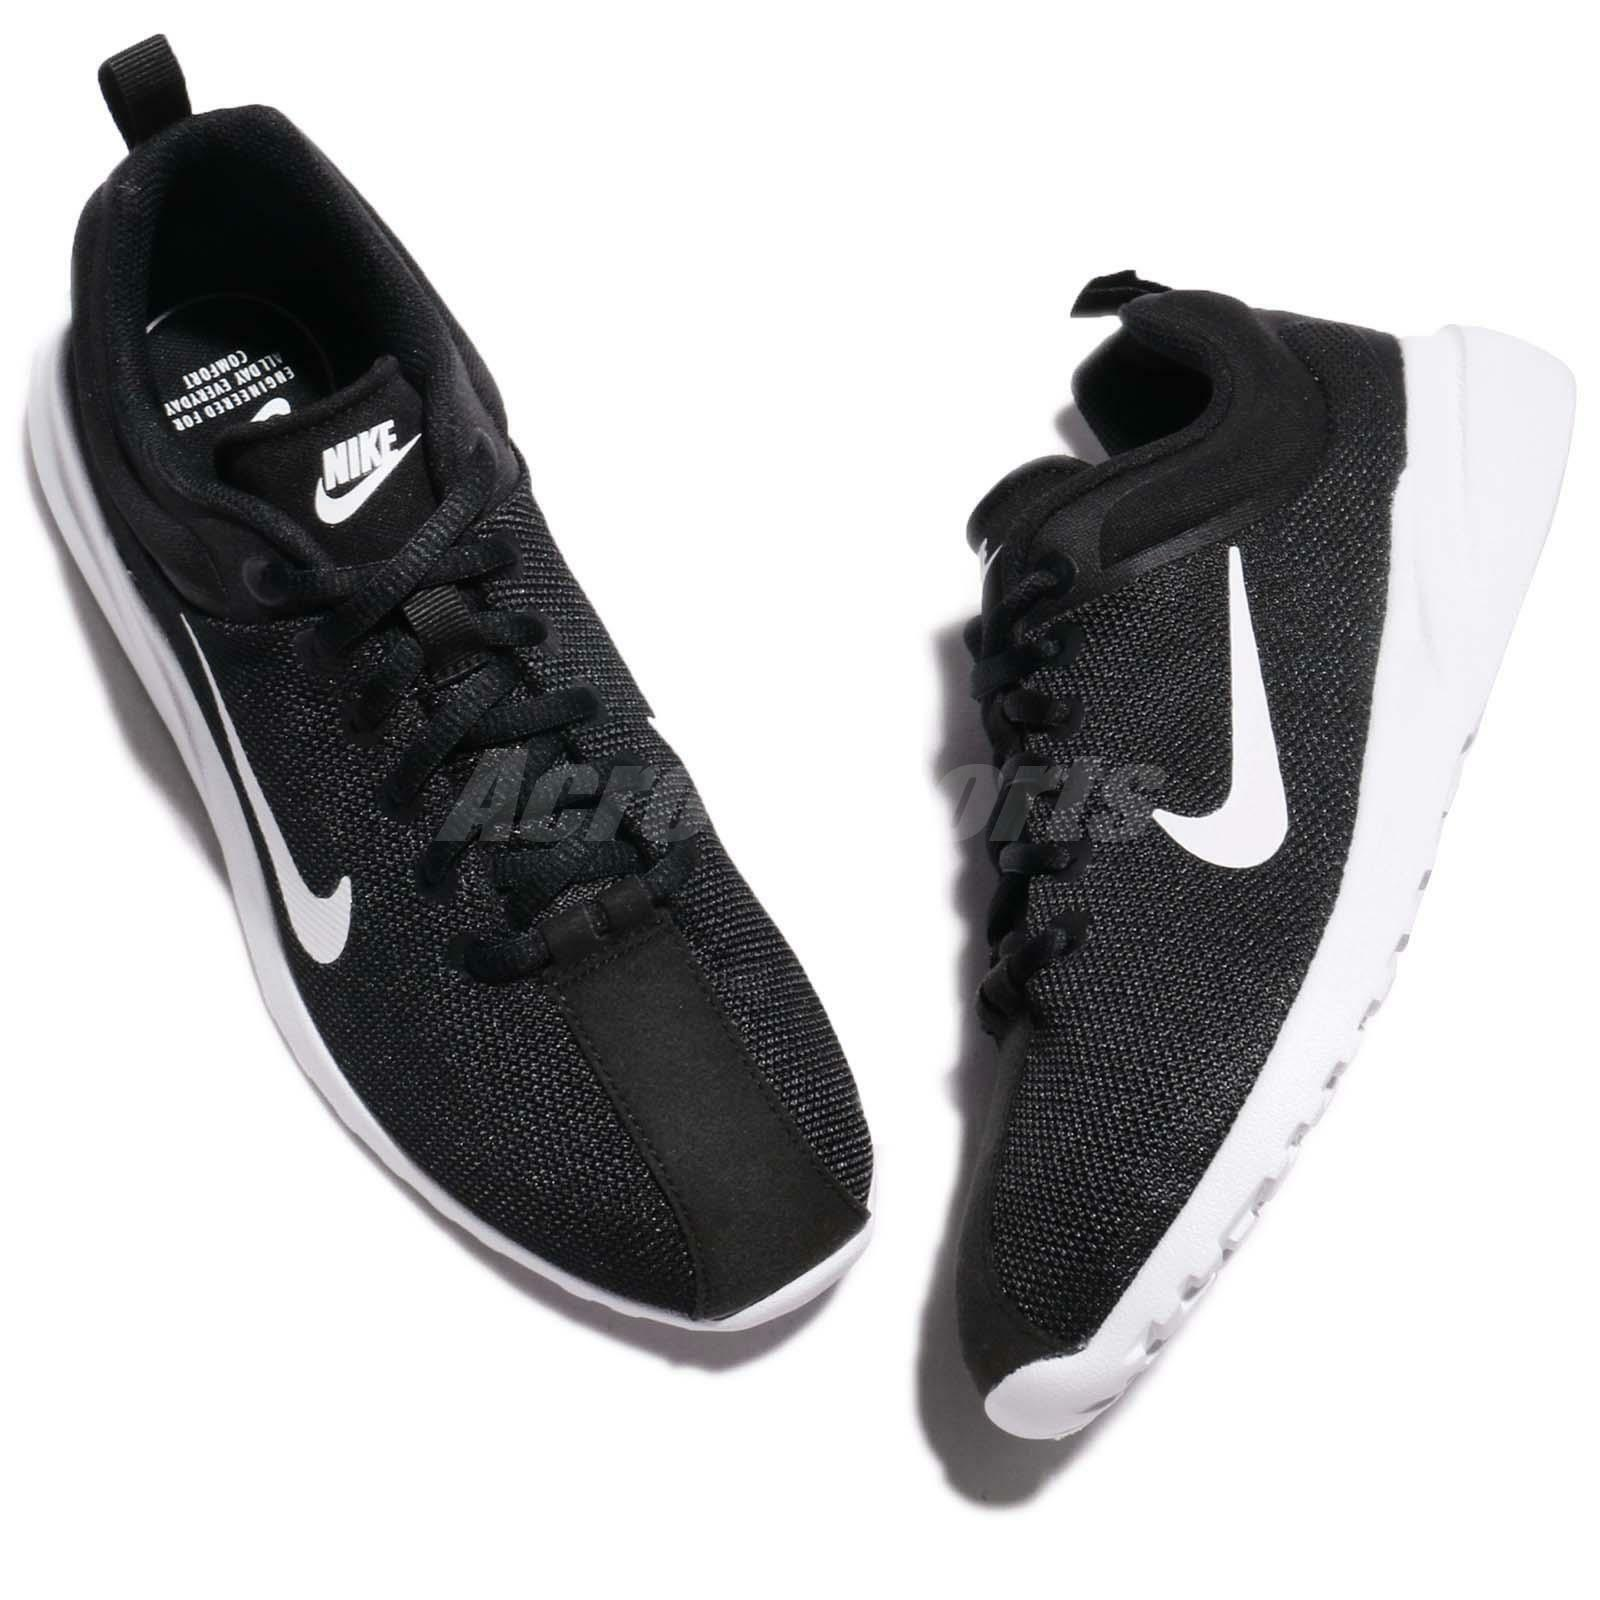 Beste Nike Free Run 2 Frauen Rosa V8X0Z : Kaufen Sie billige